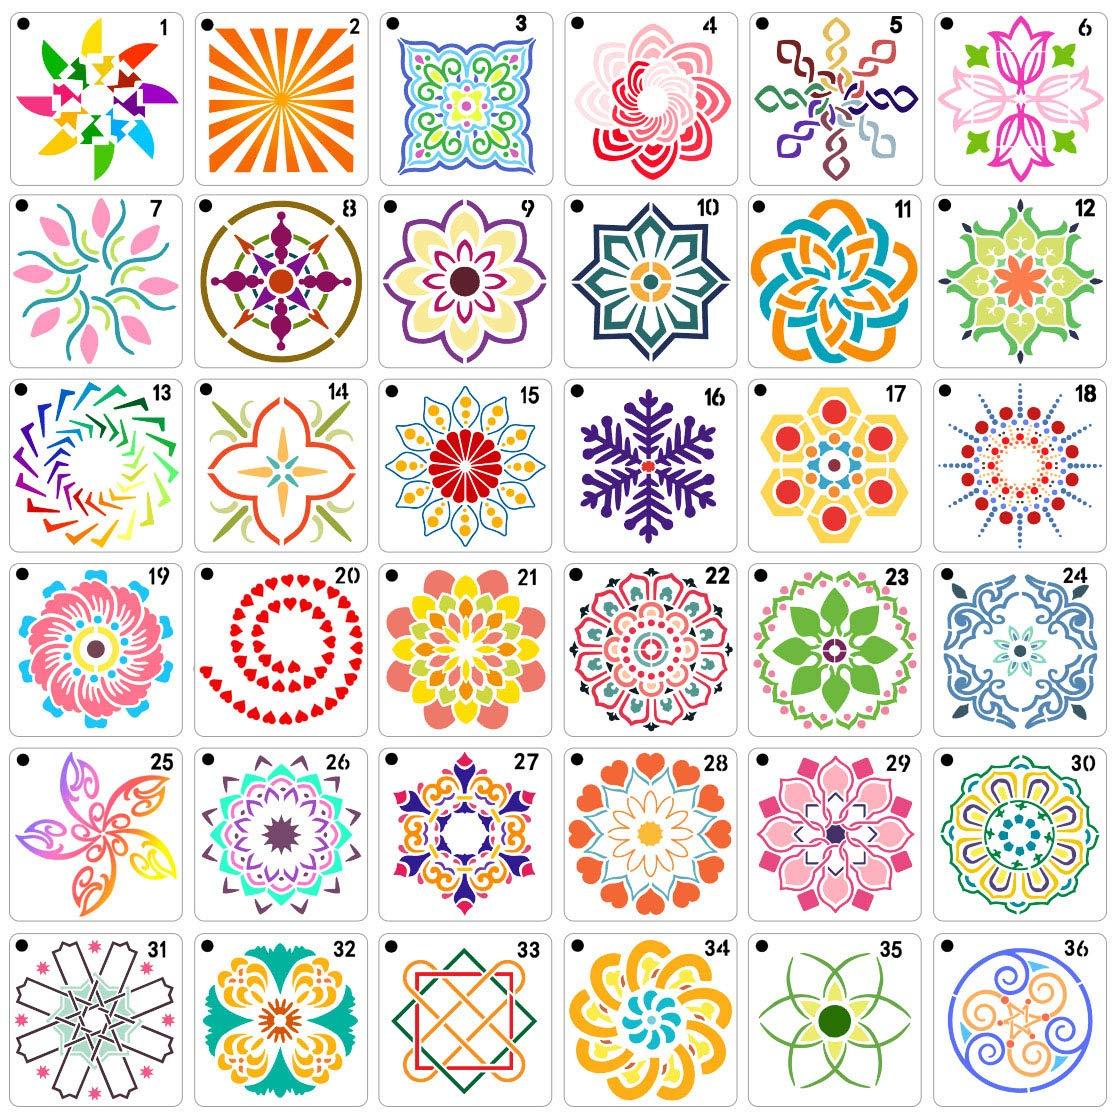 36 PCS Mandala Stencils Mandala Dot Painting Stencils Templates for Rocks Wood Wall Painting Art Projects